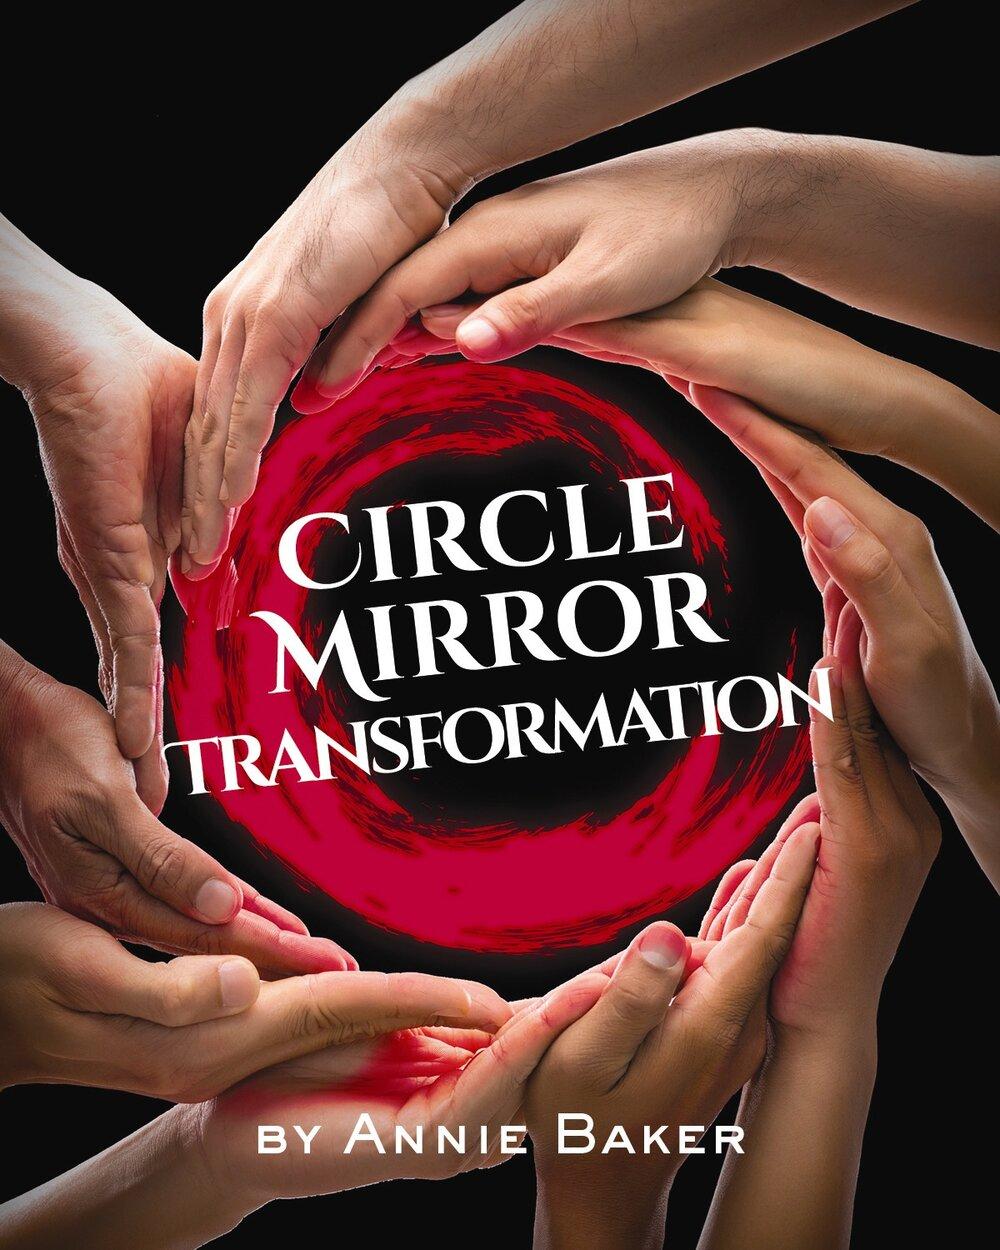 CircleMirrorTransformation.jpg